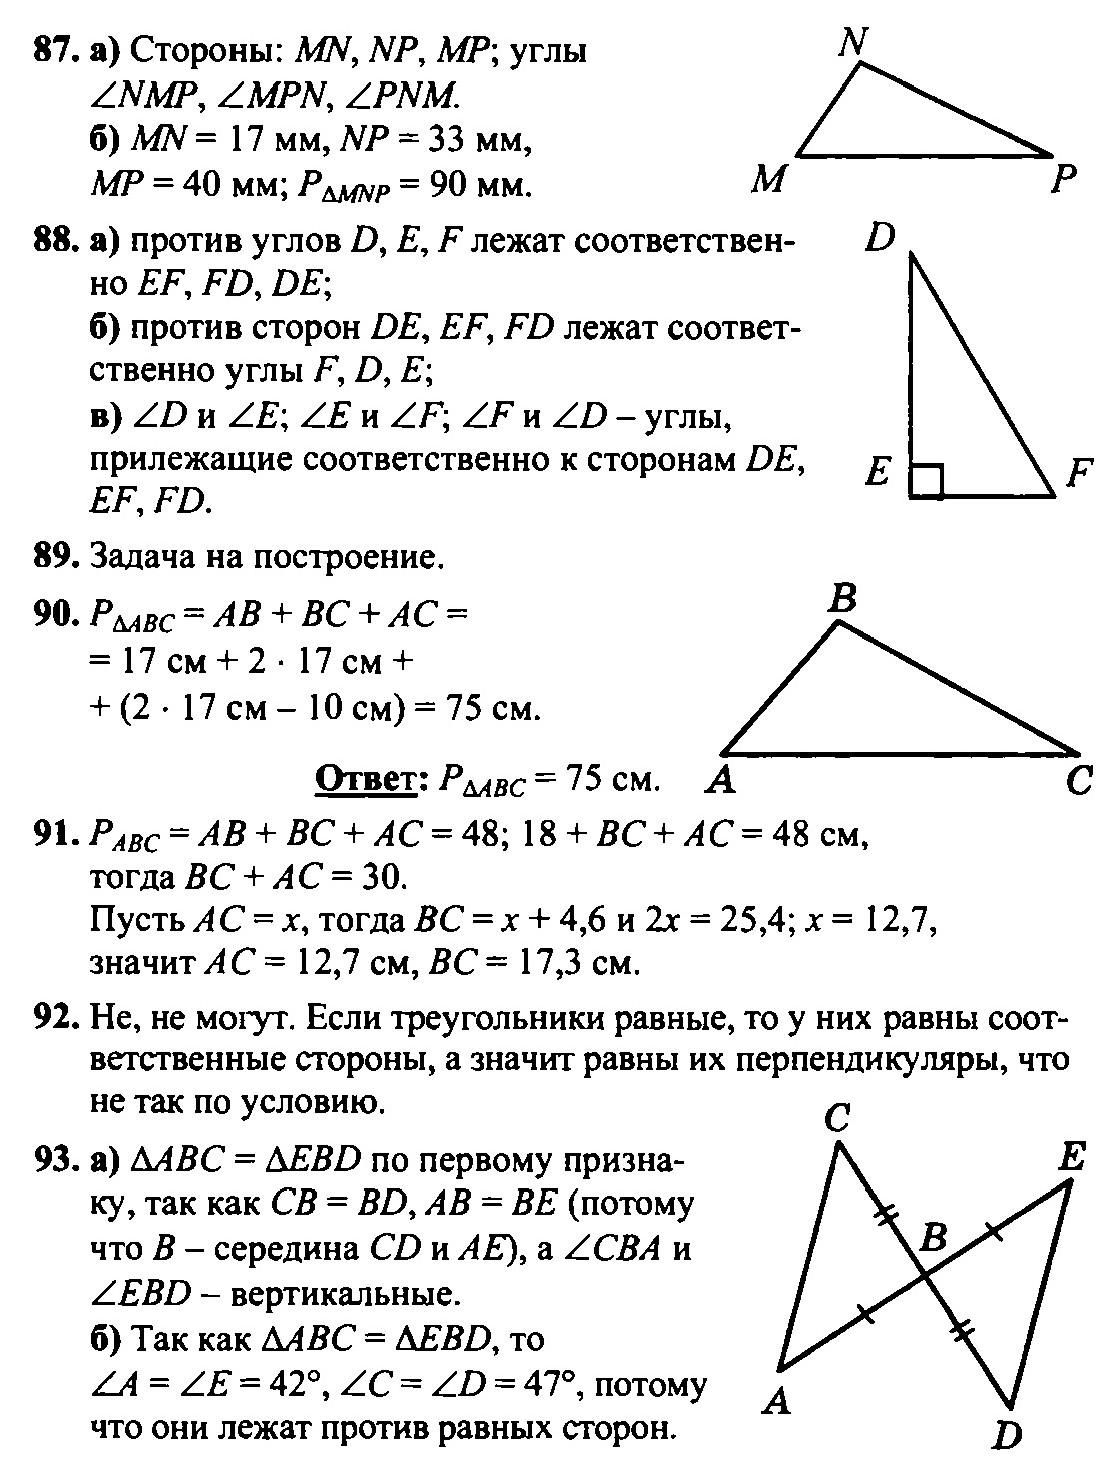 ГДЗ Атанасян Учебник. Задания 87 - 99